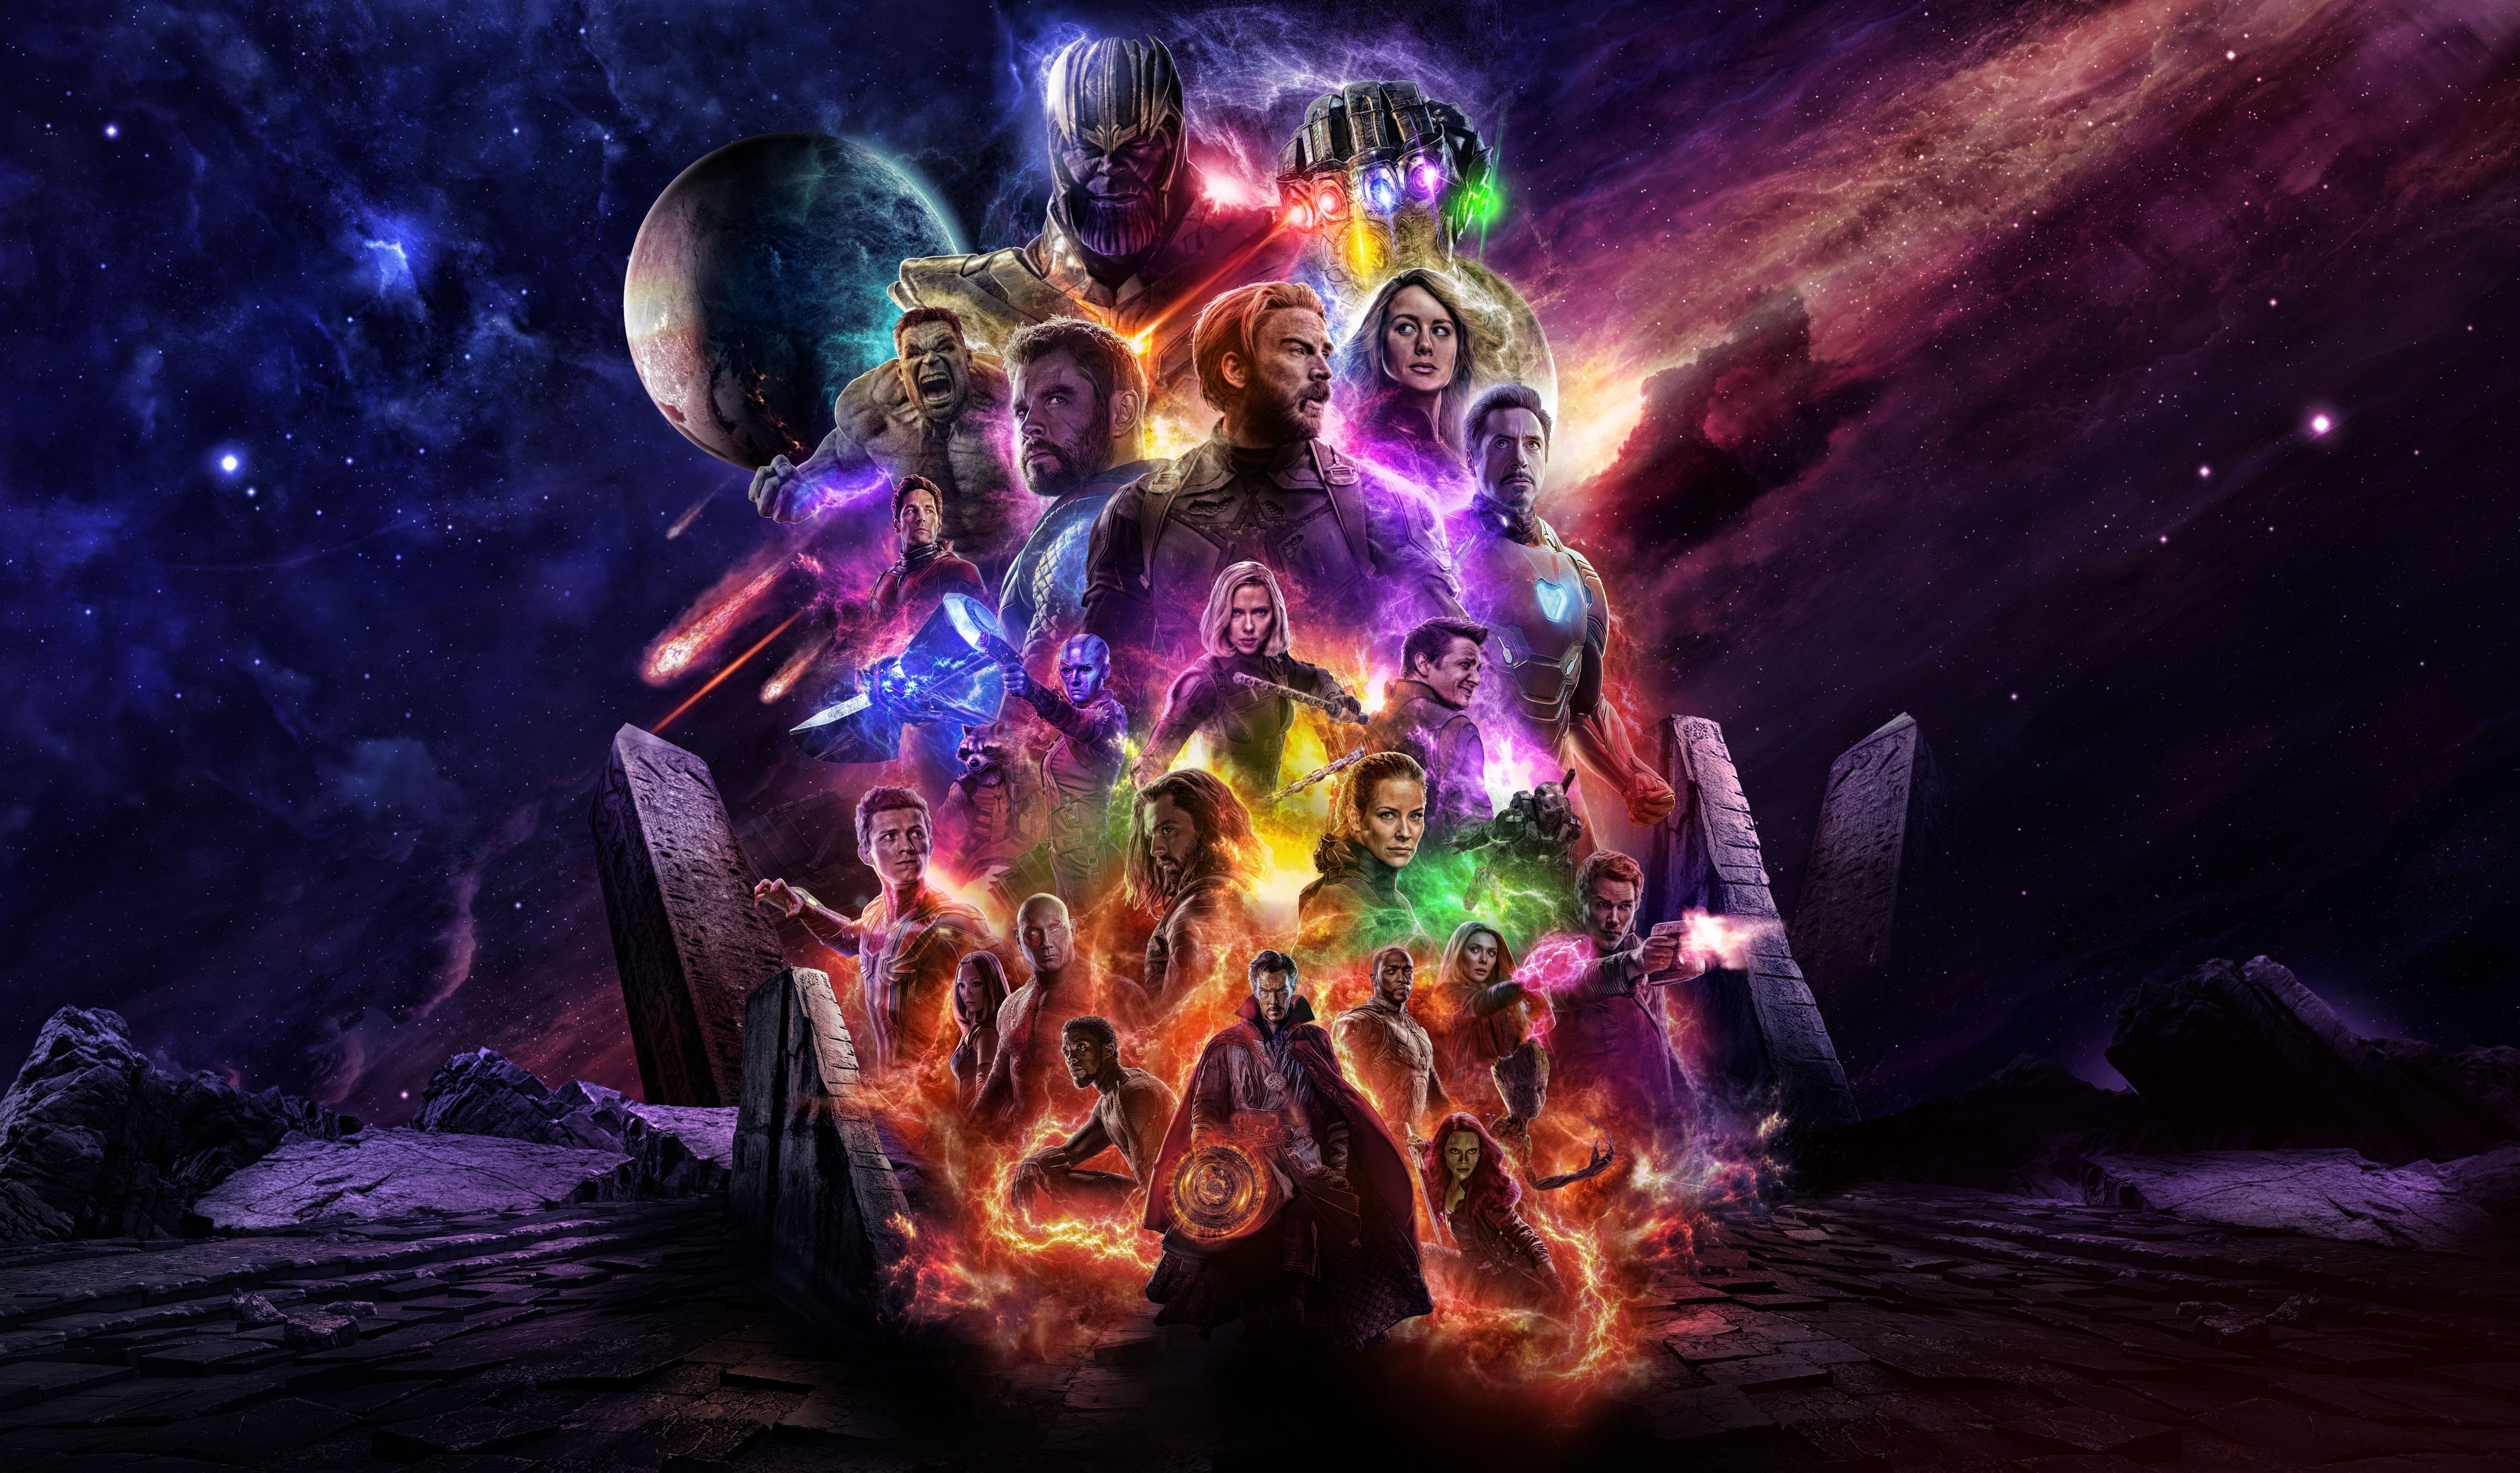 Pin By Marvel Lous Studios On Avengers Marvel Movies Avengers Marvel Cinematic